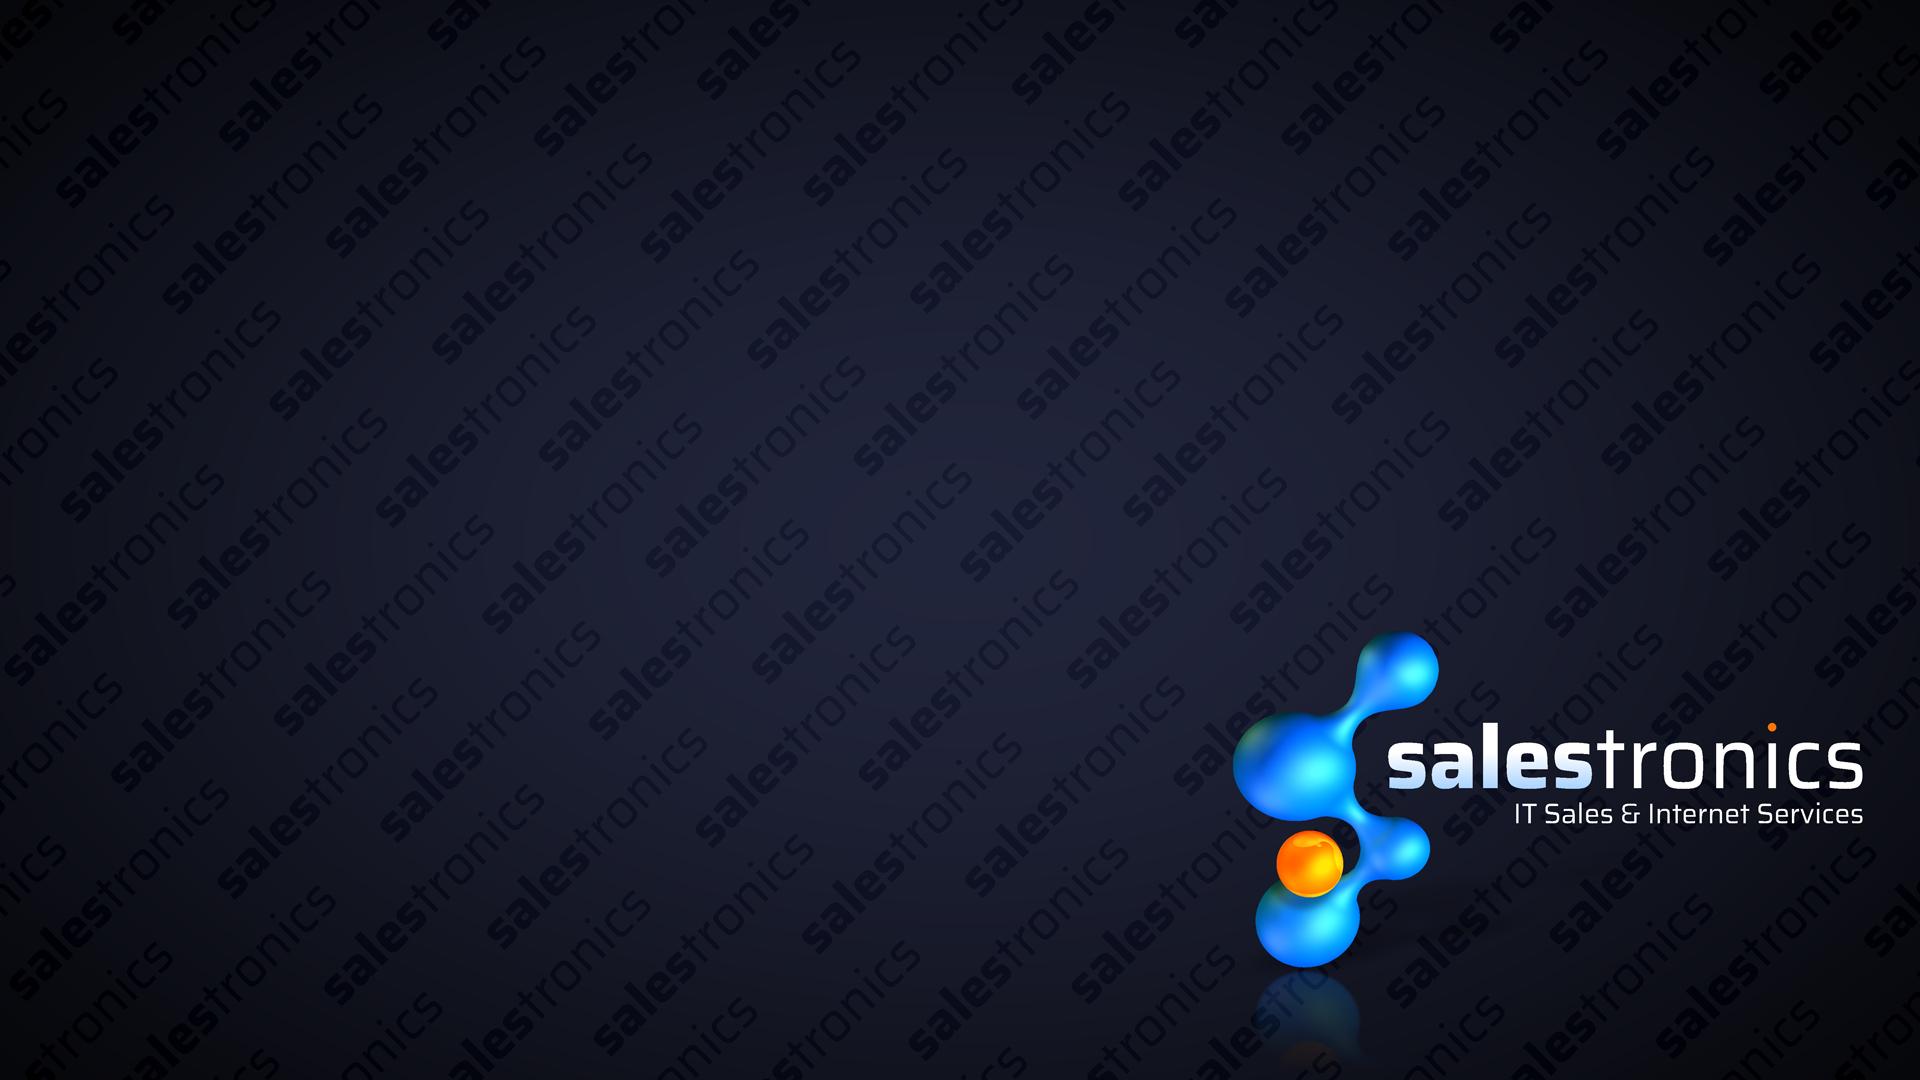 Downloads | Salestronics